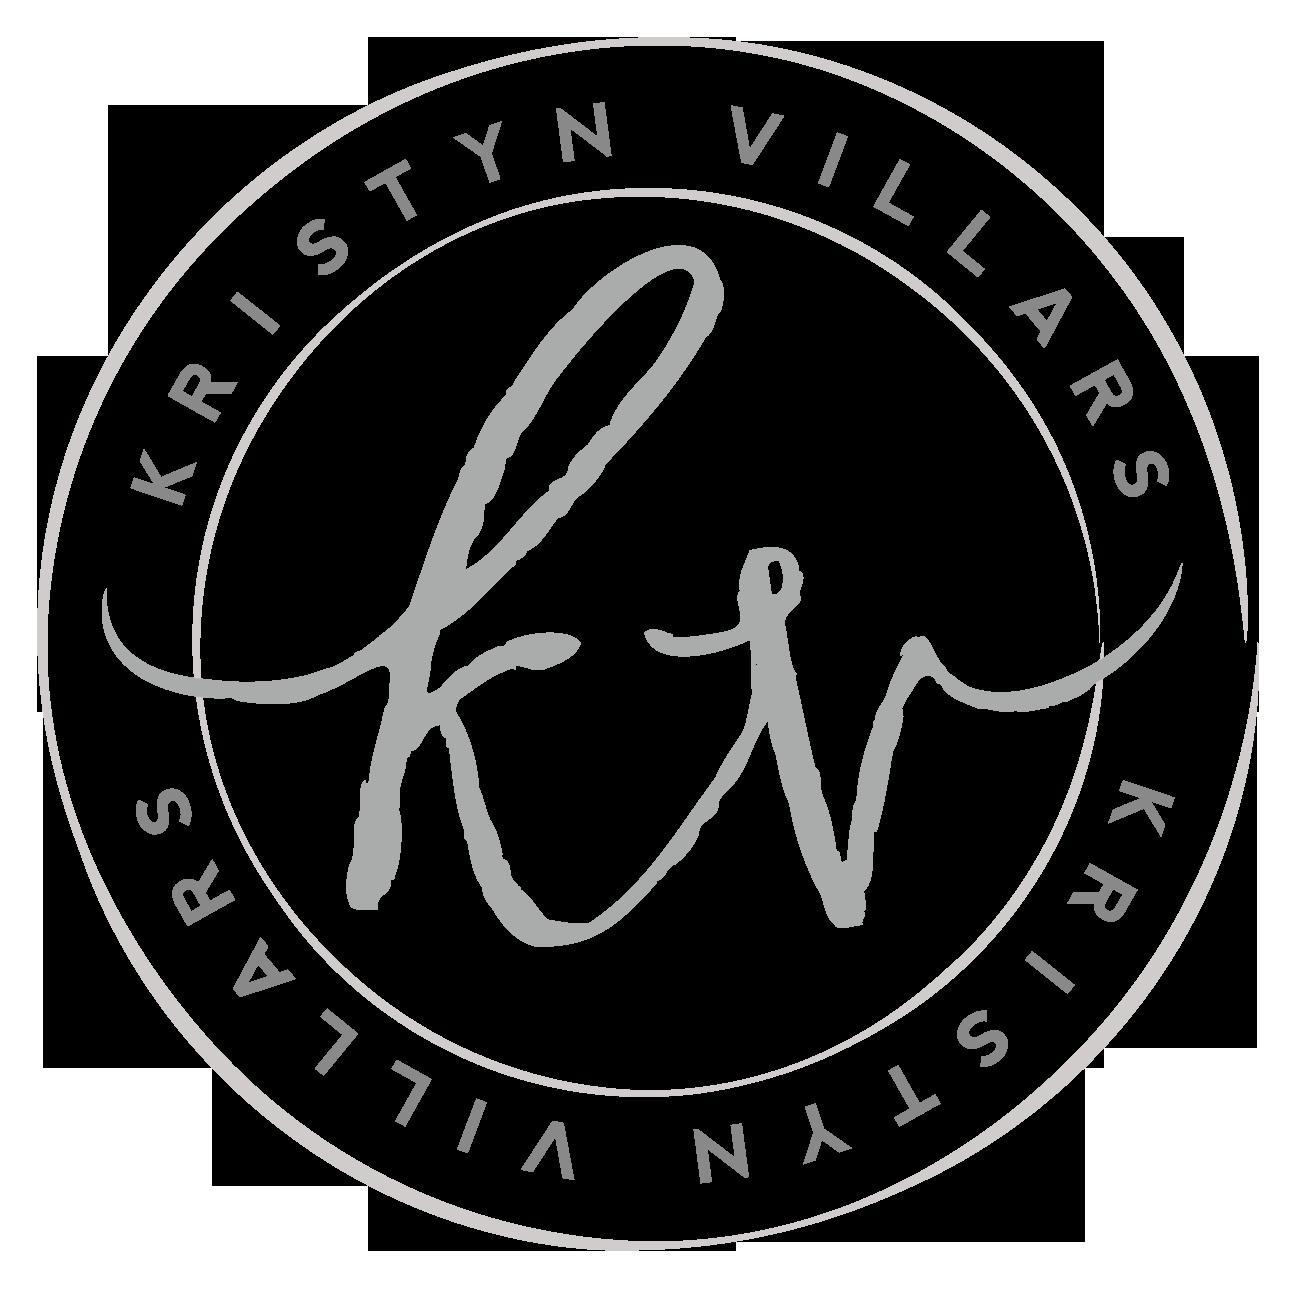 Kristyn Villars Photography-brand